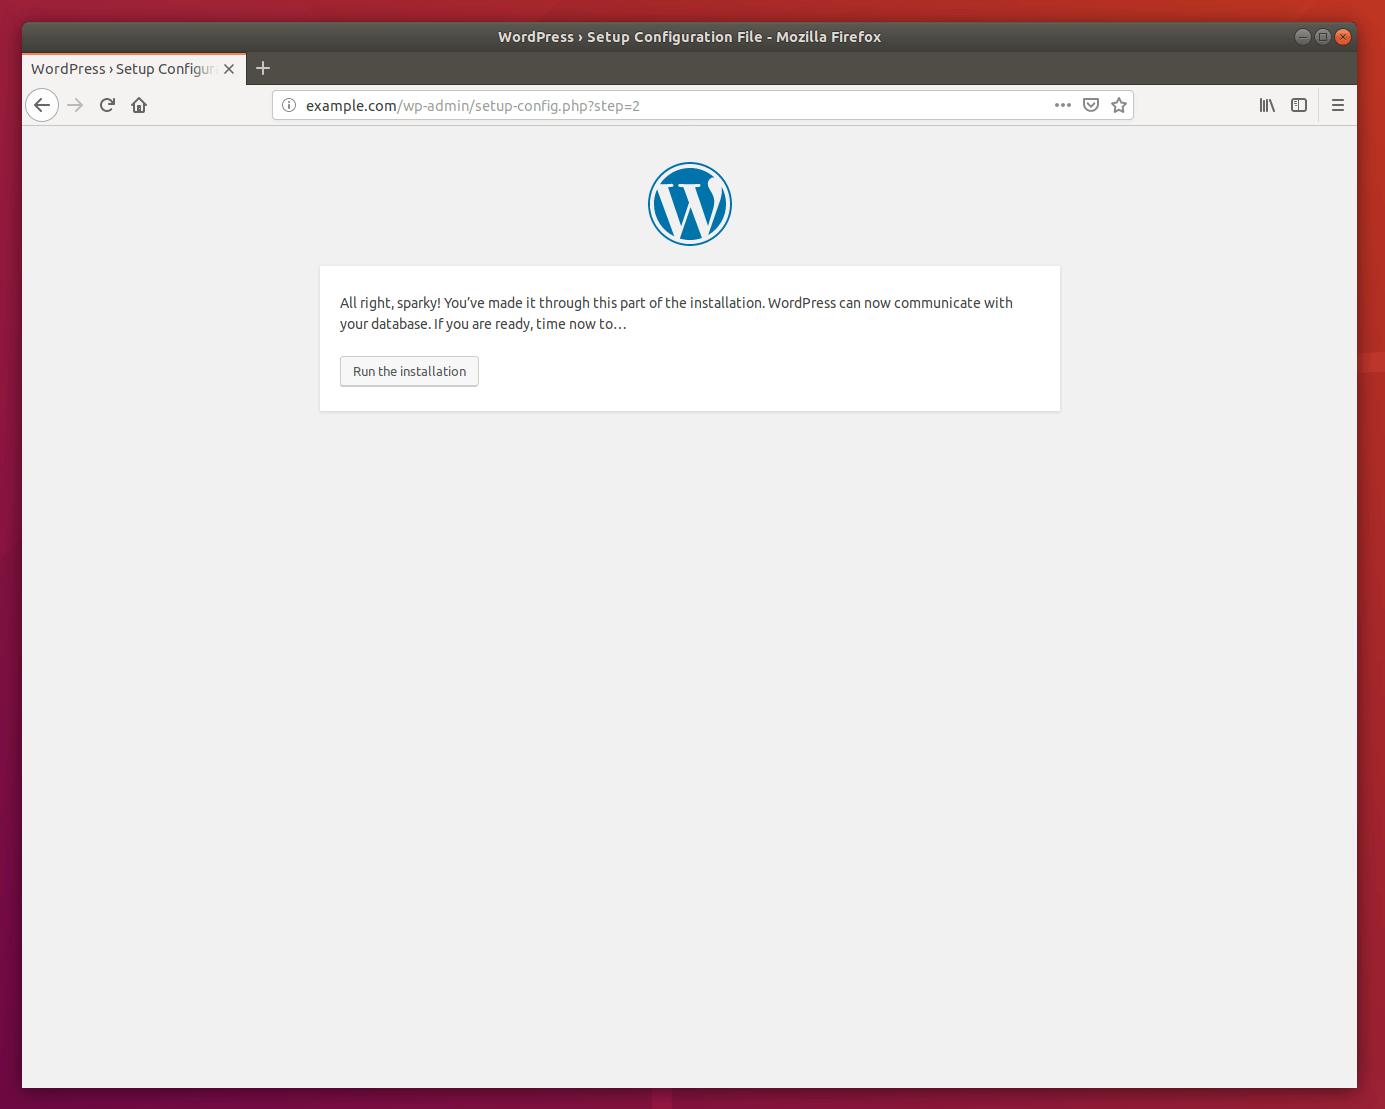 WordPress Ubuntu installation